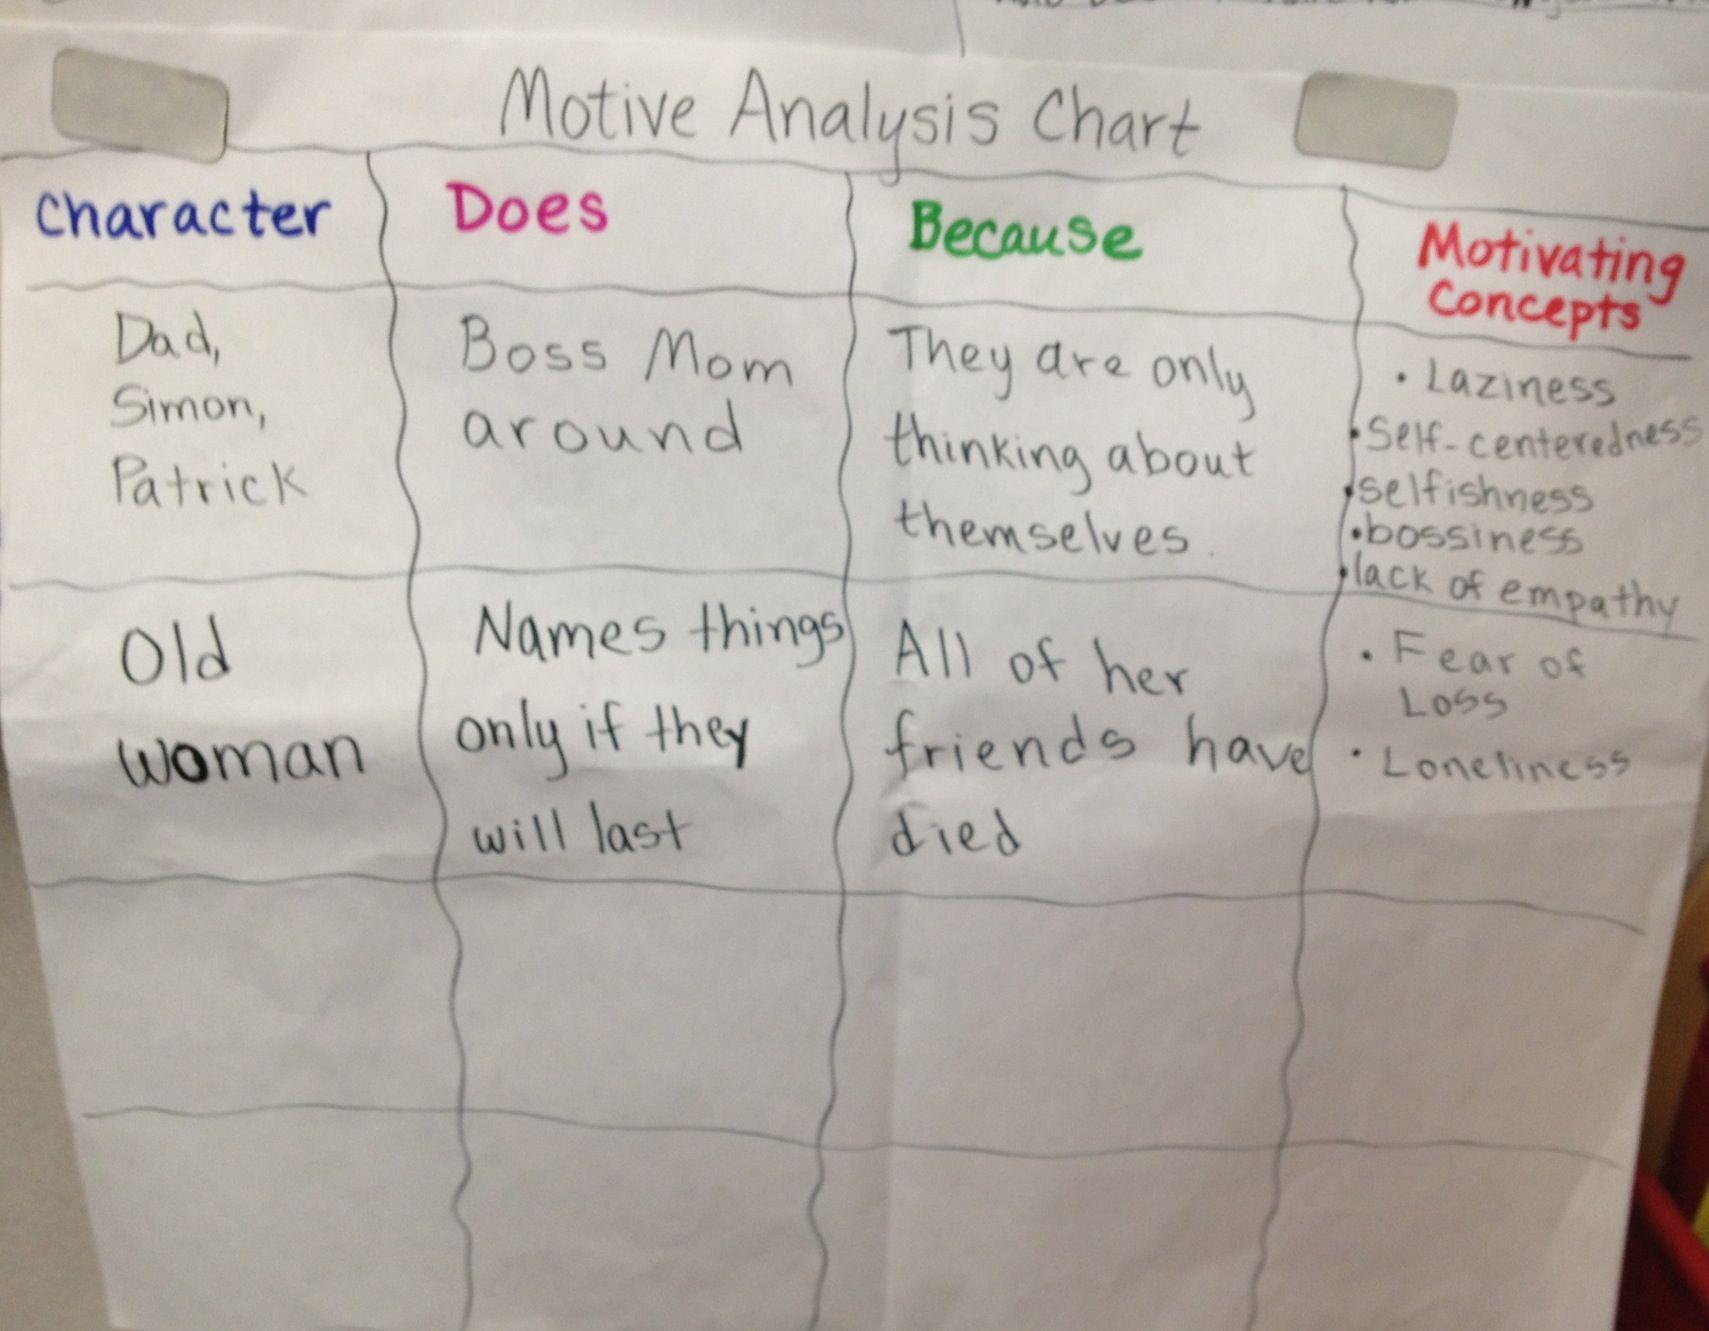 Characters Motiveysis Chart